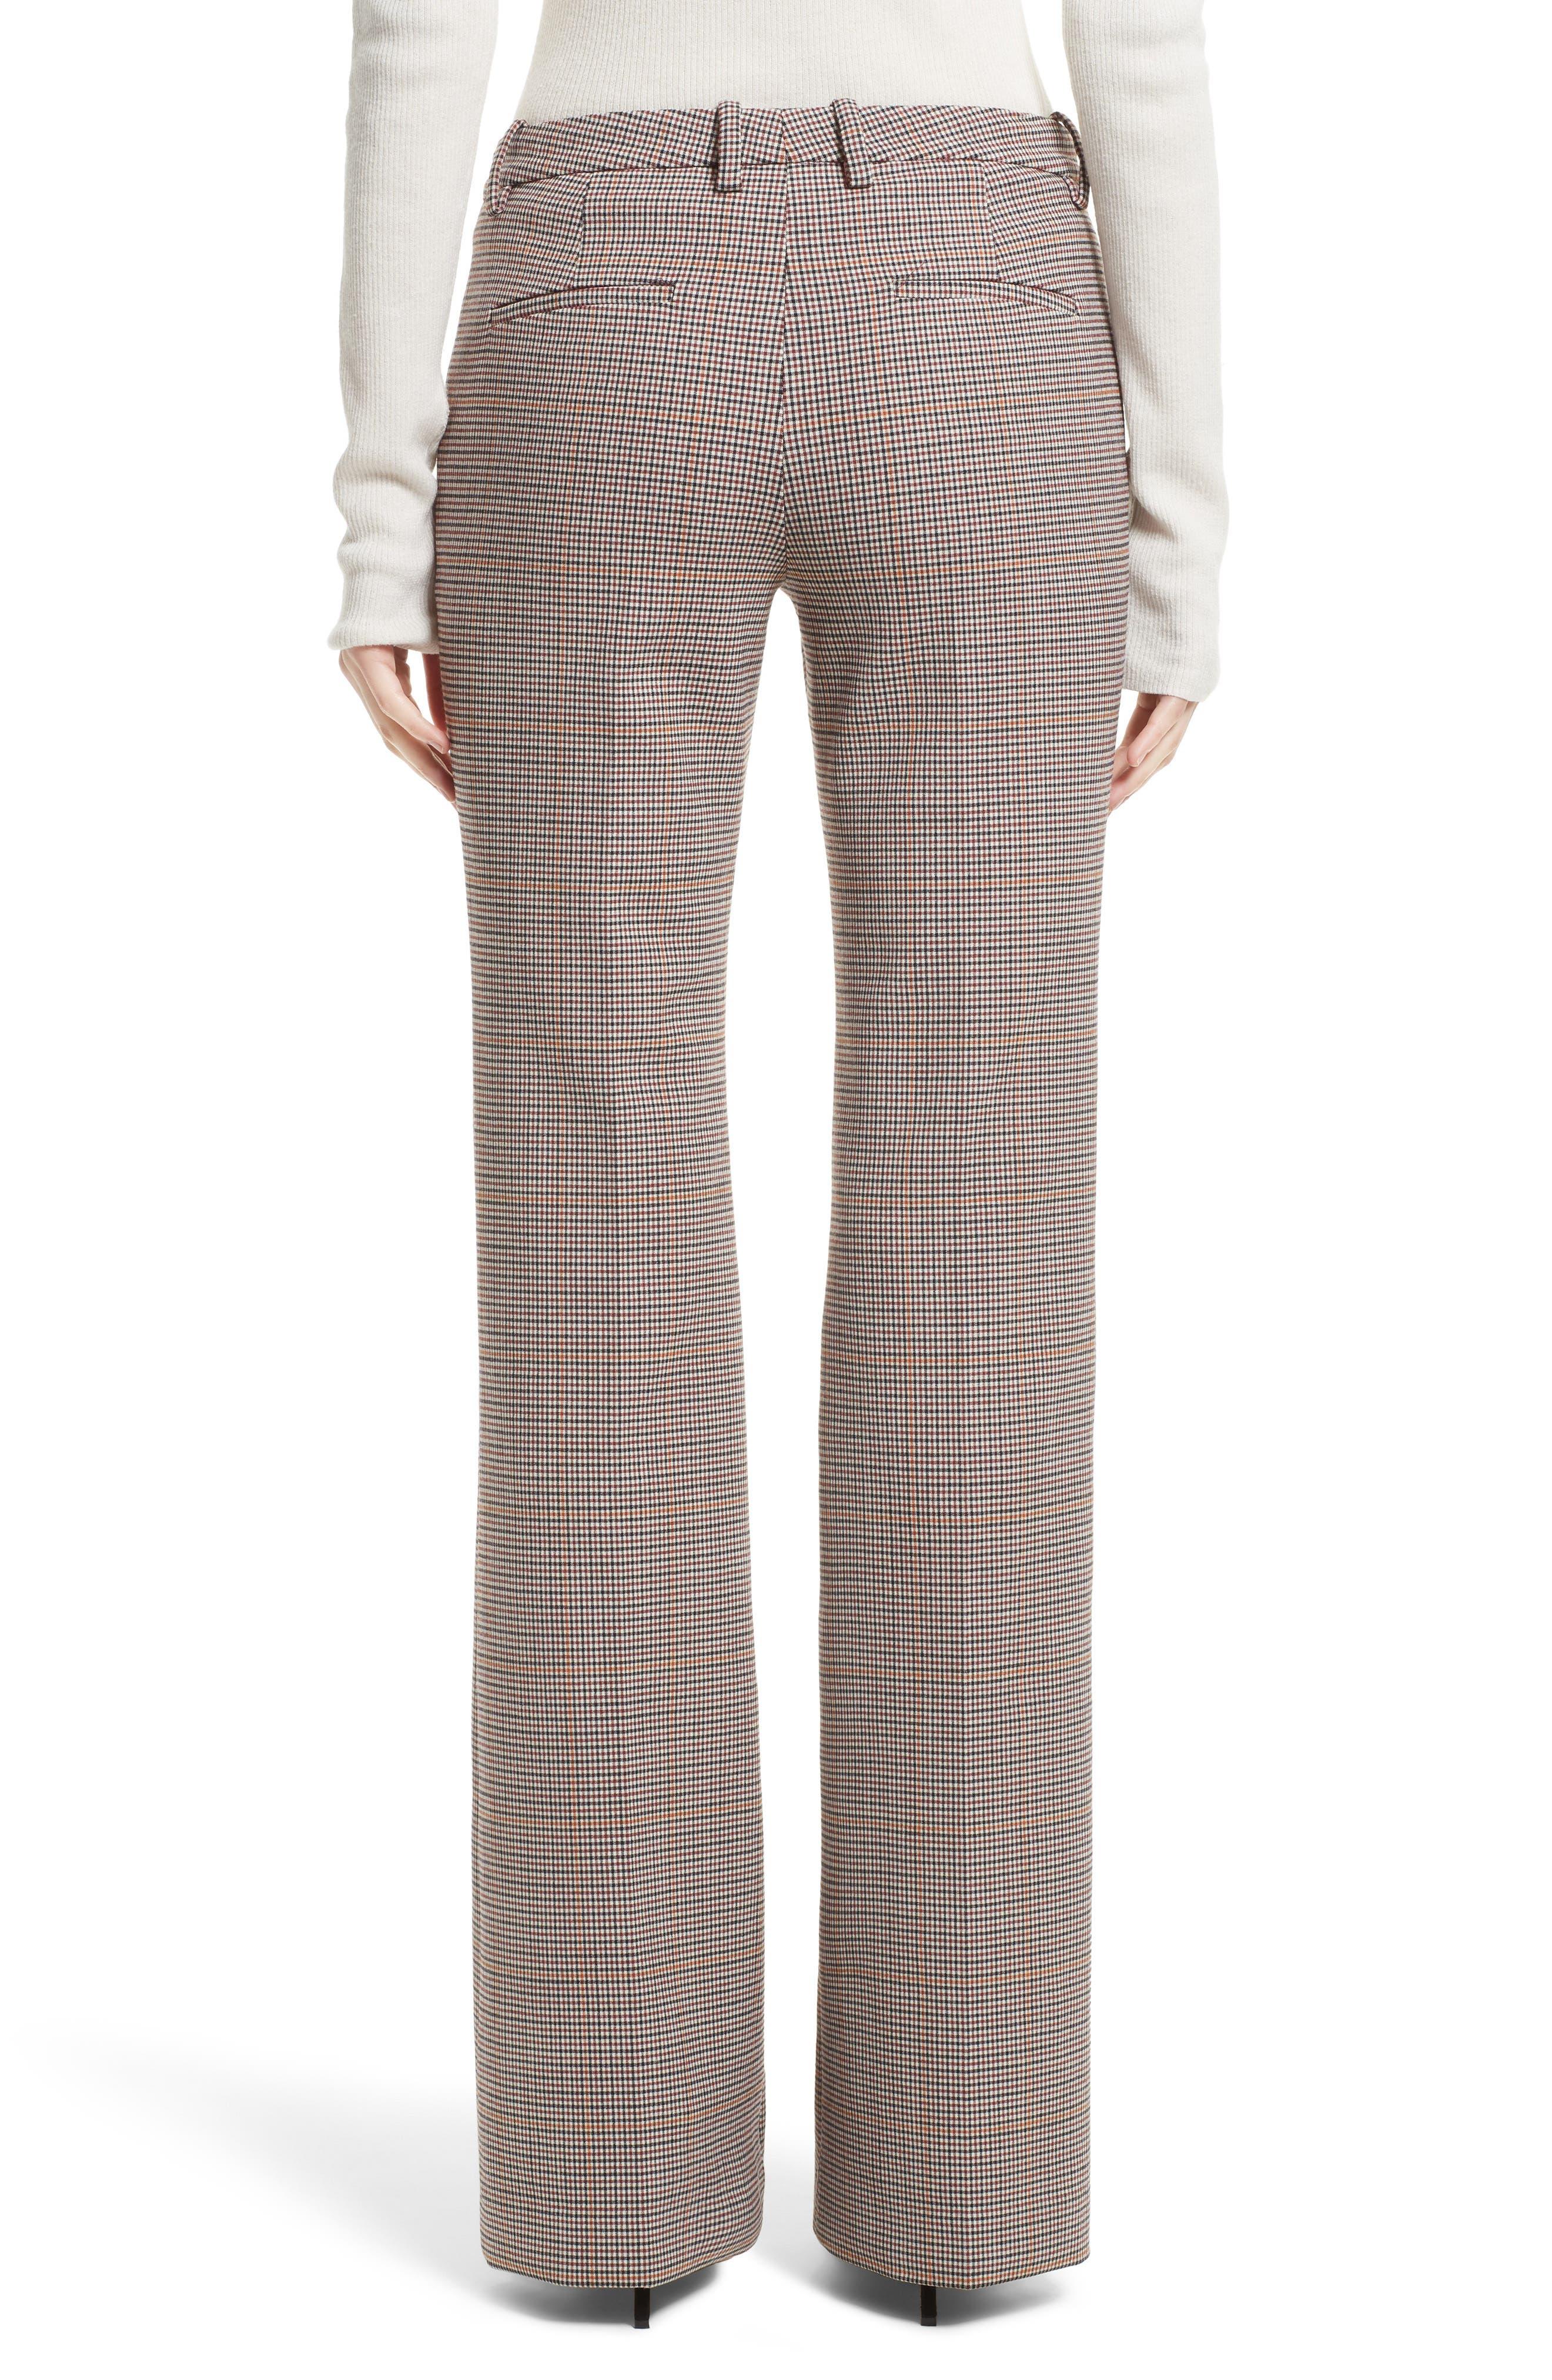 Demitria 2 Flare Leg Stretch Wool Pants,                             Alternate thumbnail 2, color,                             Multi